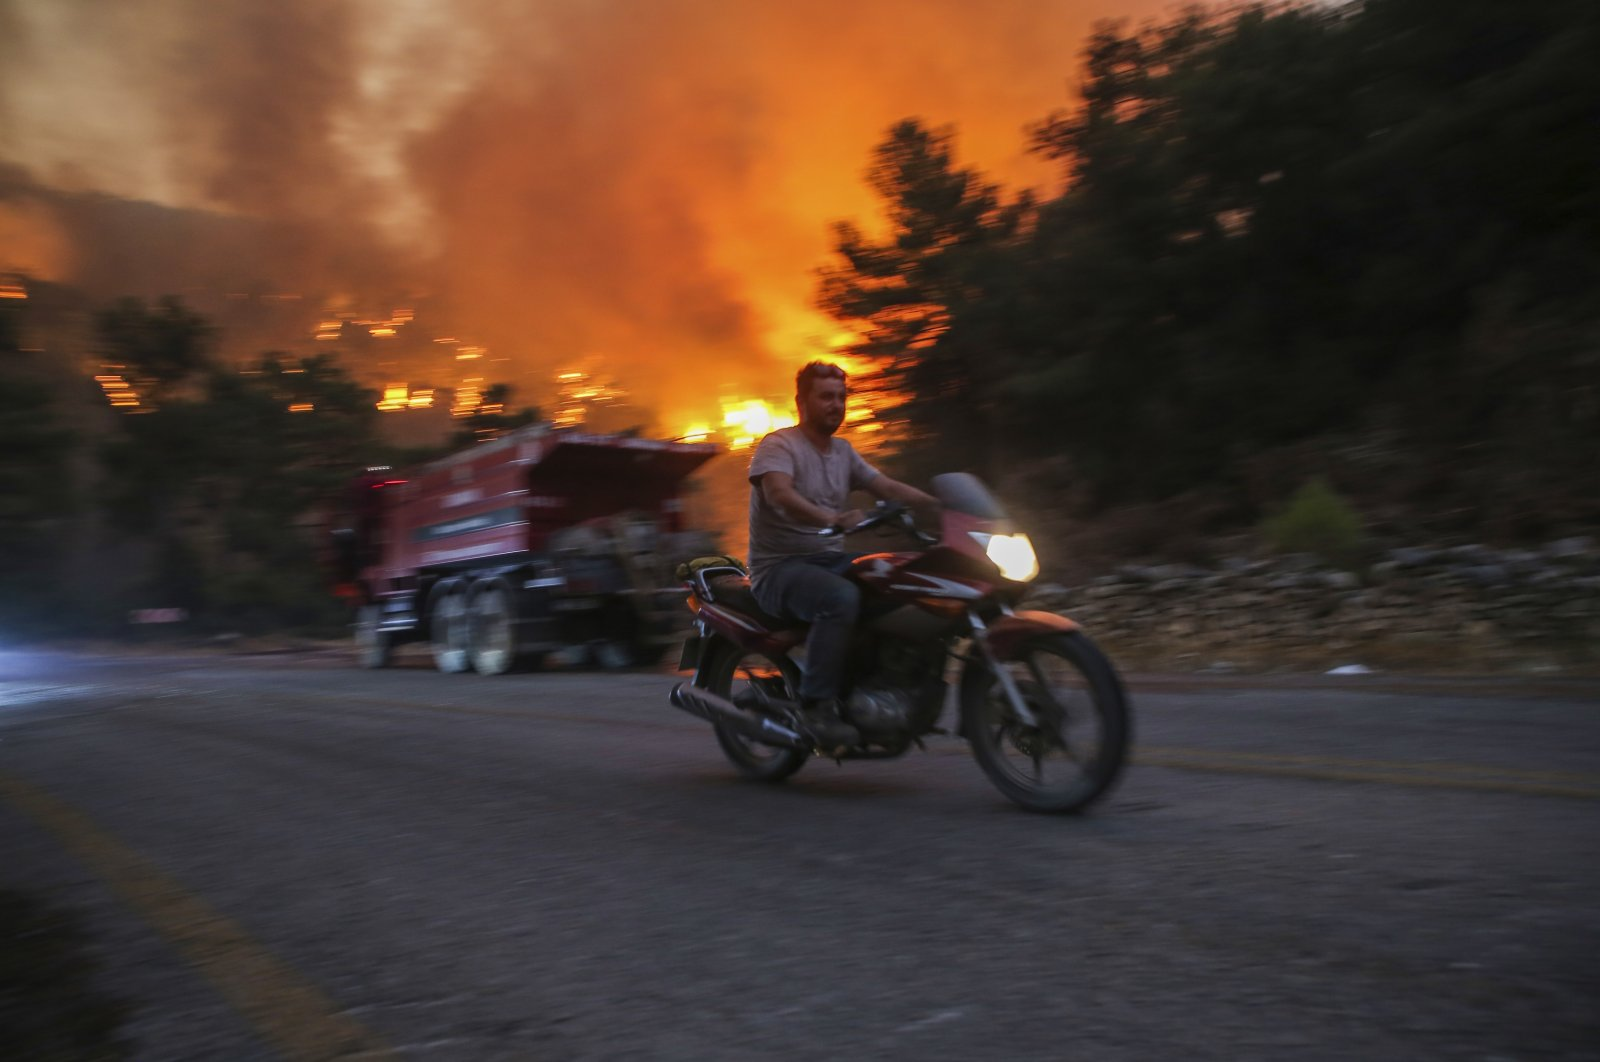 A man rides away from an advancing fire in Çökertme village, near Bodrum, Muğla province, Turkey, Aug. 2, 2021. (AP Photo)